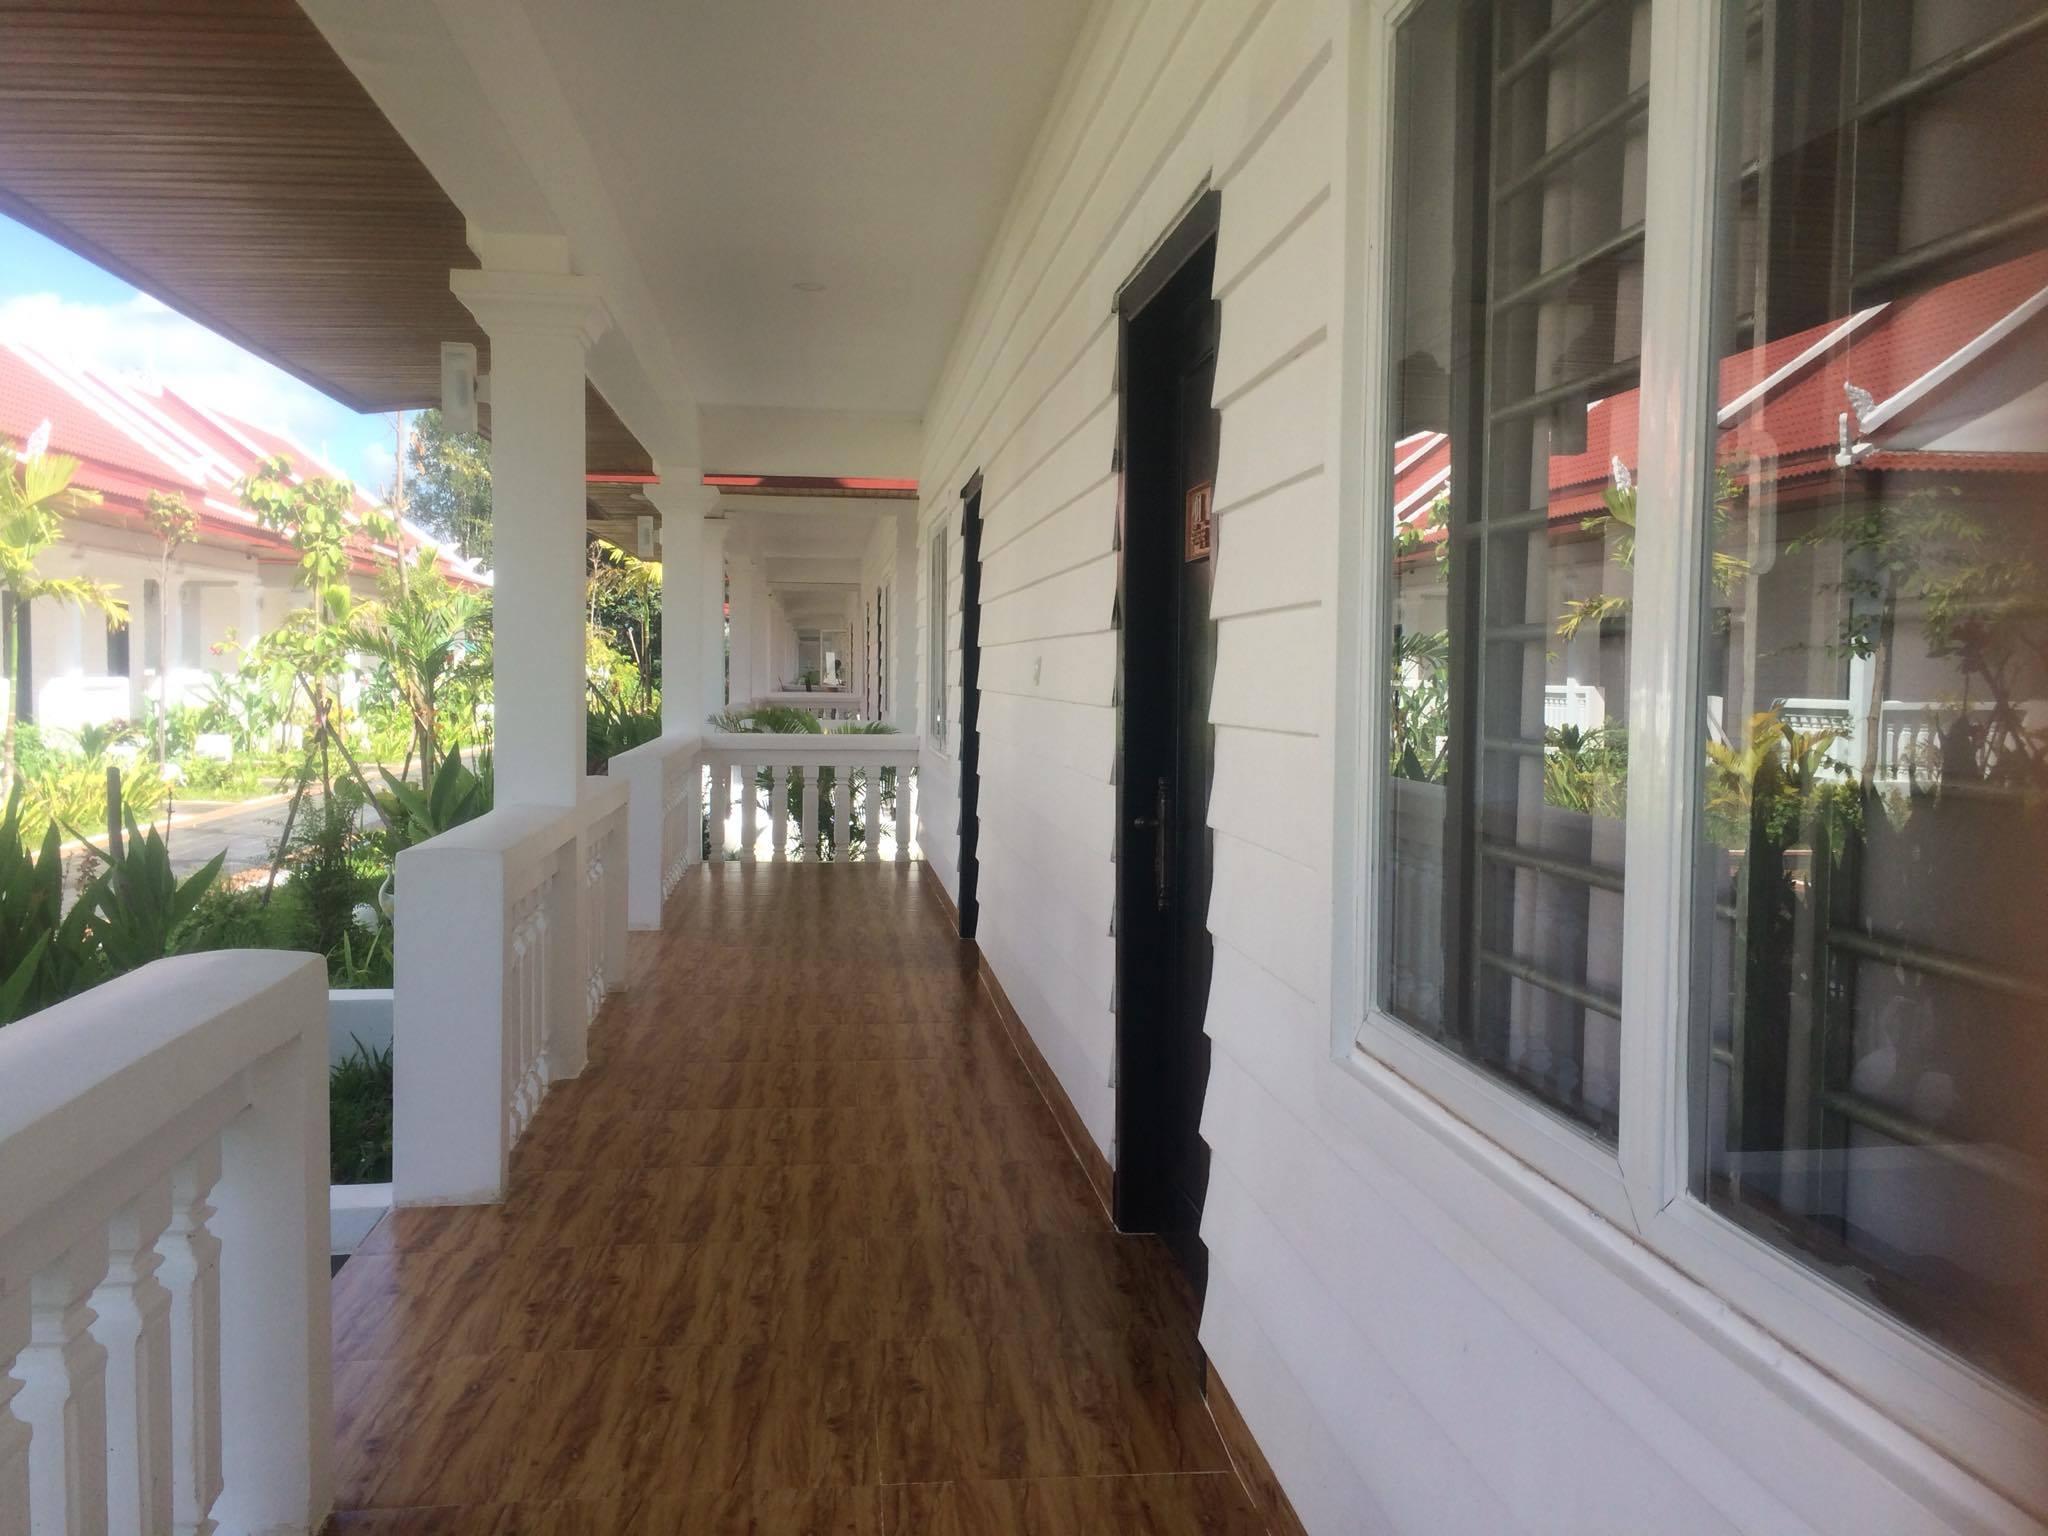 Preah Vihear Jaya Hotel, Choam Khsant